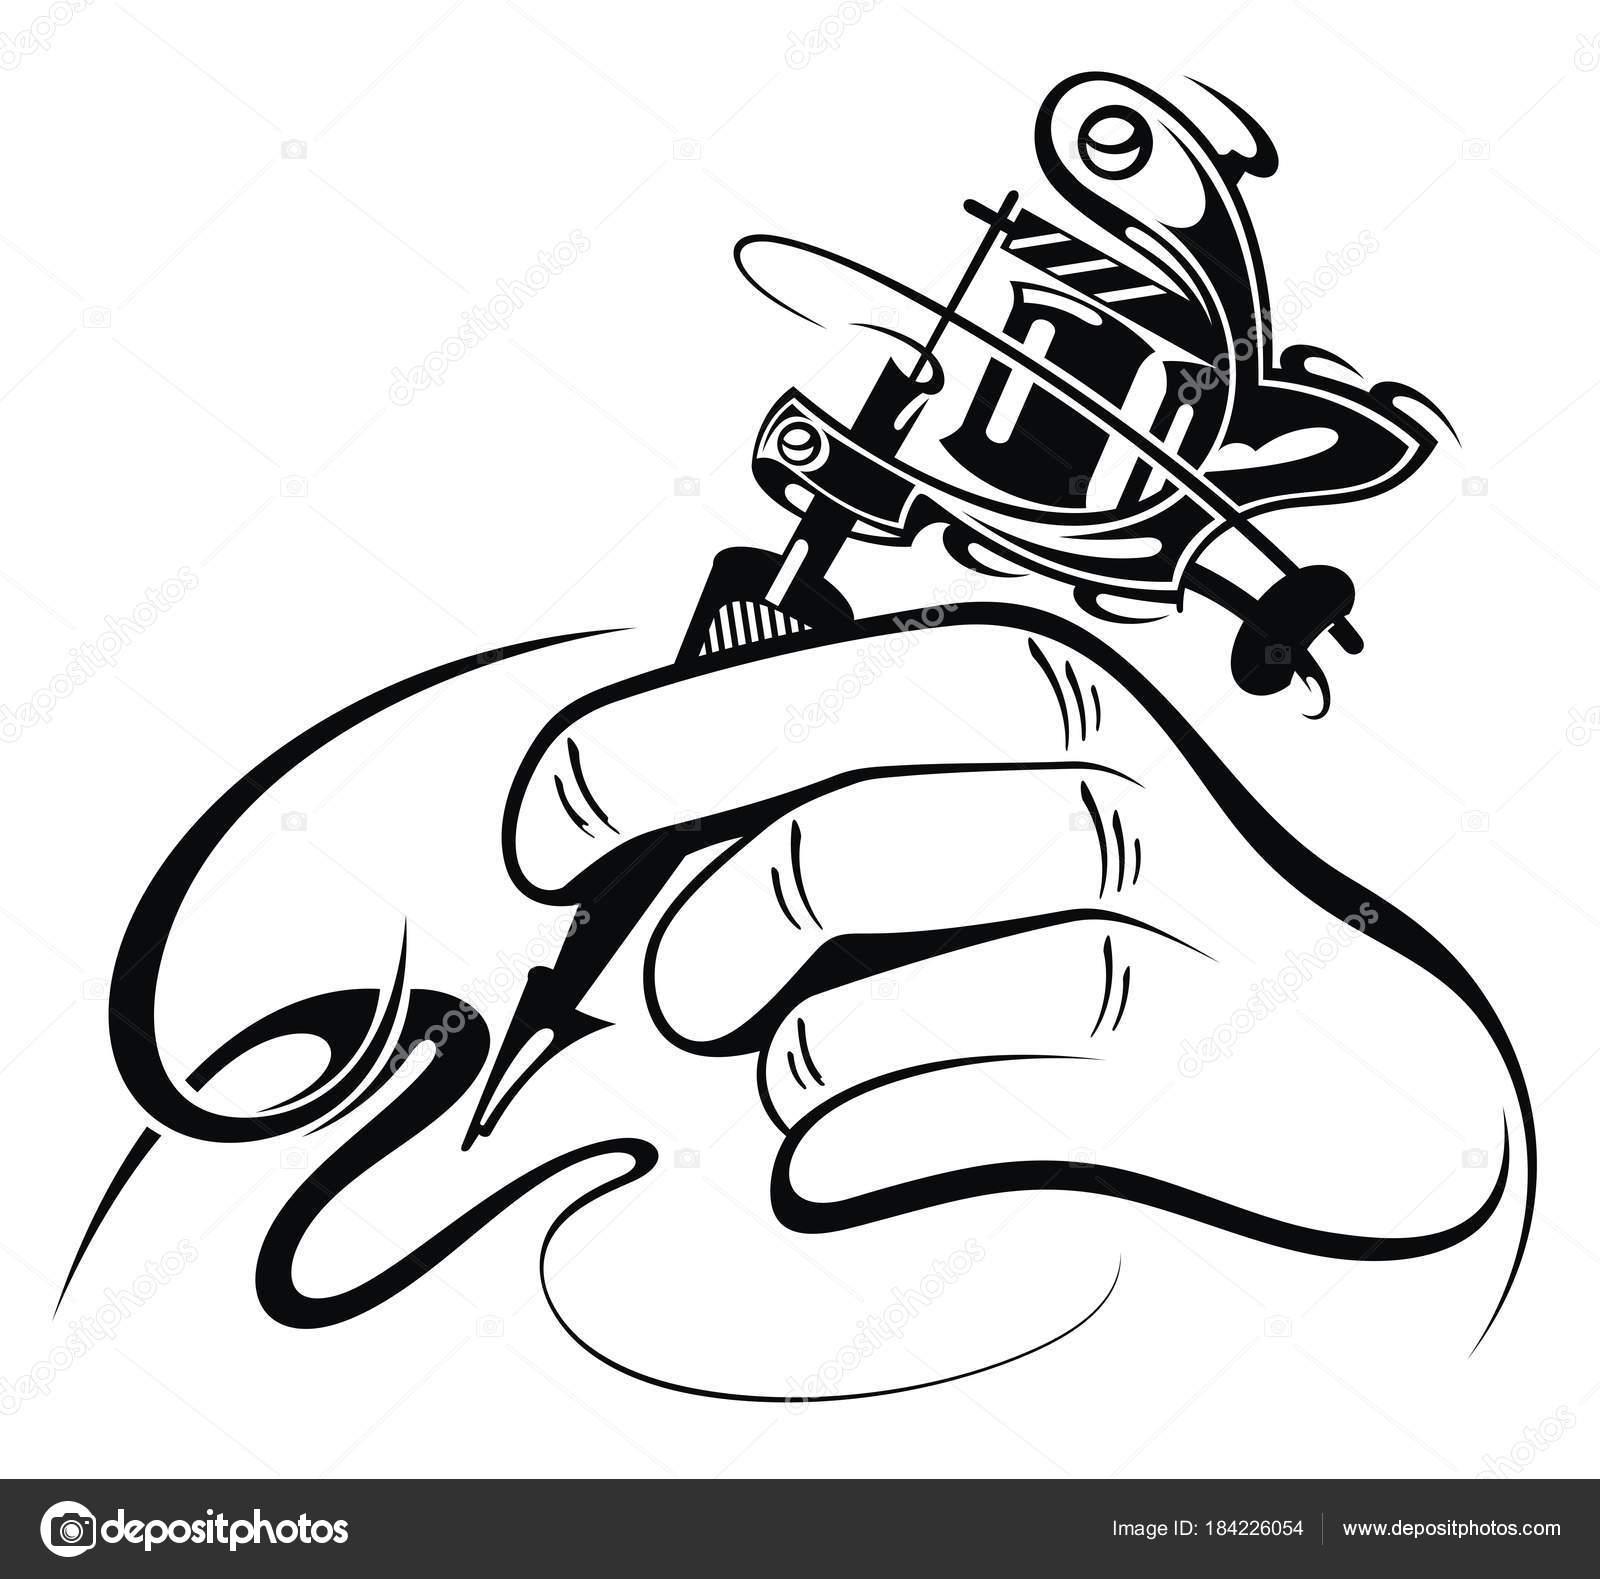 Black White Design Hand Manual Tattoo Machine — Stock